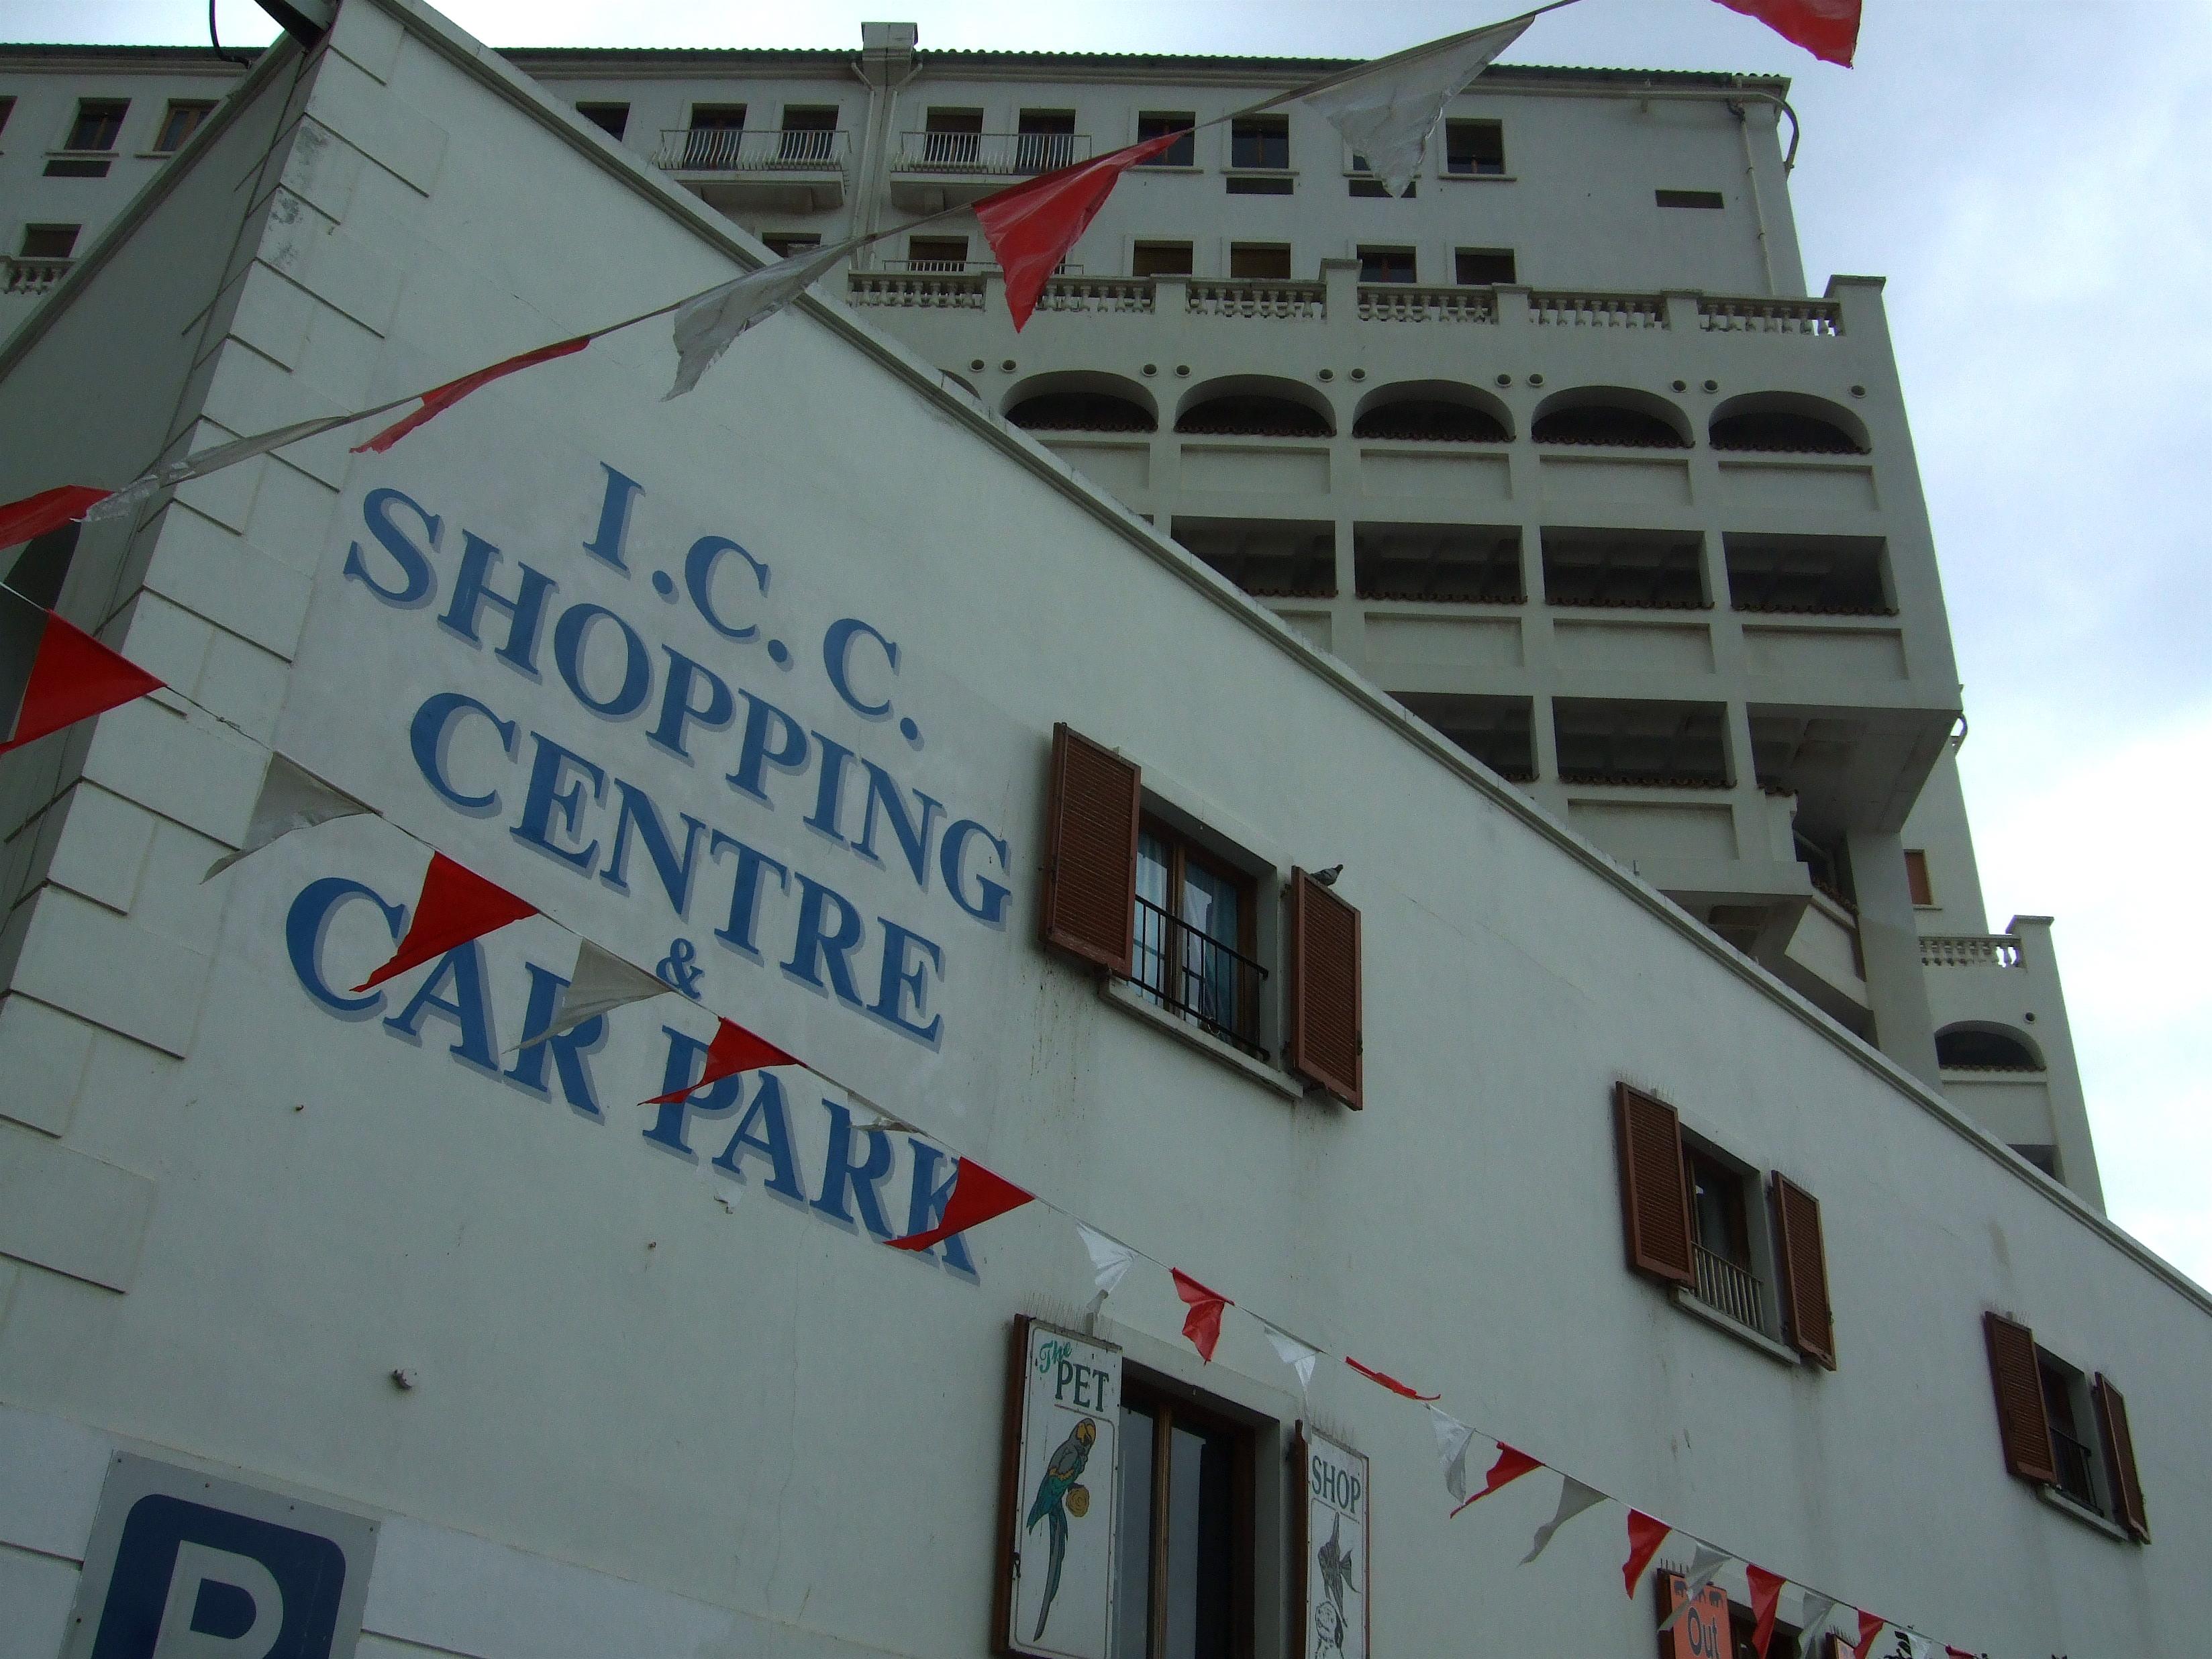 The Square Shopping Centre Car Park